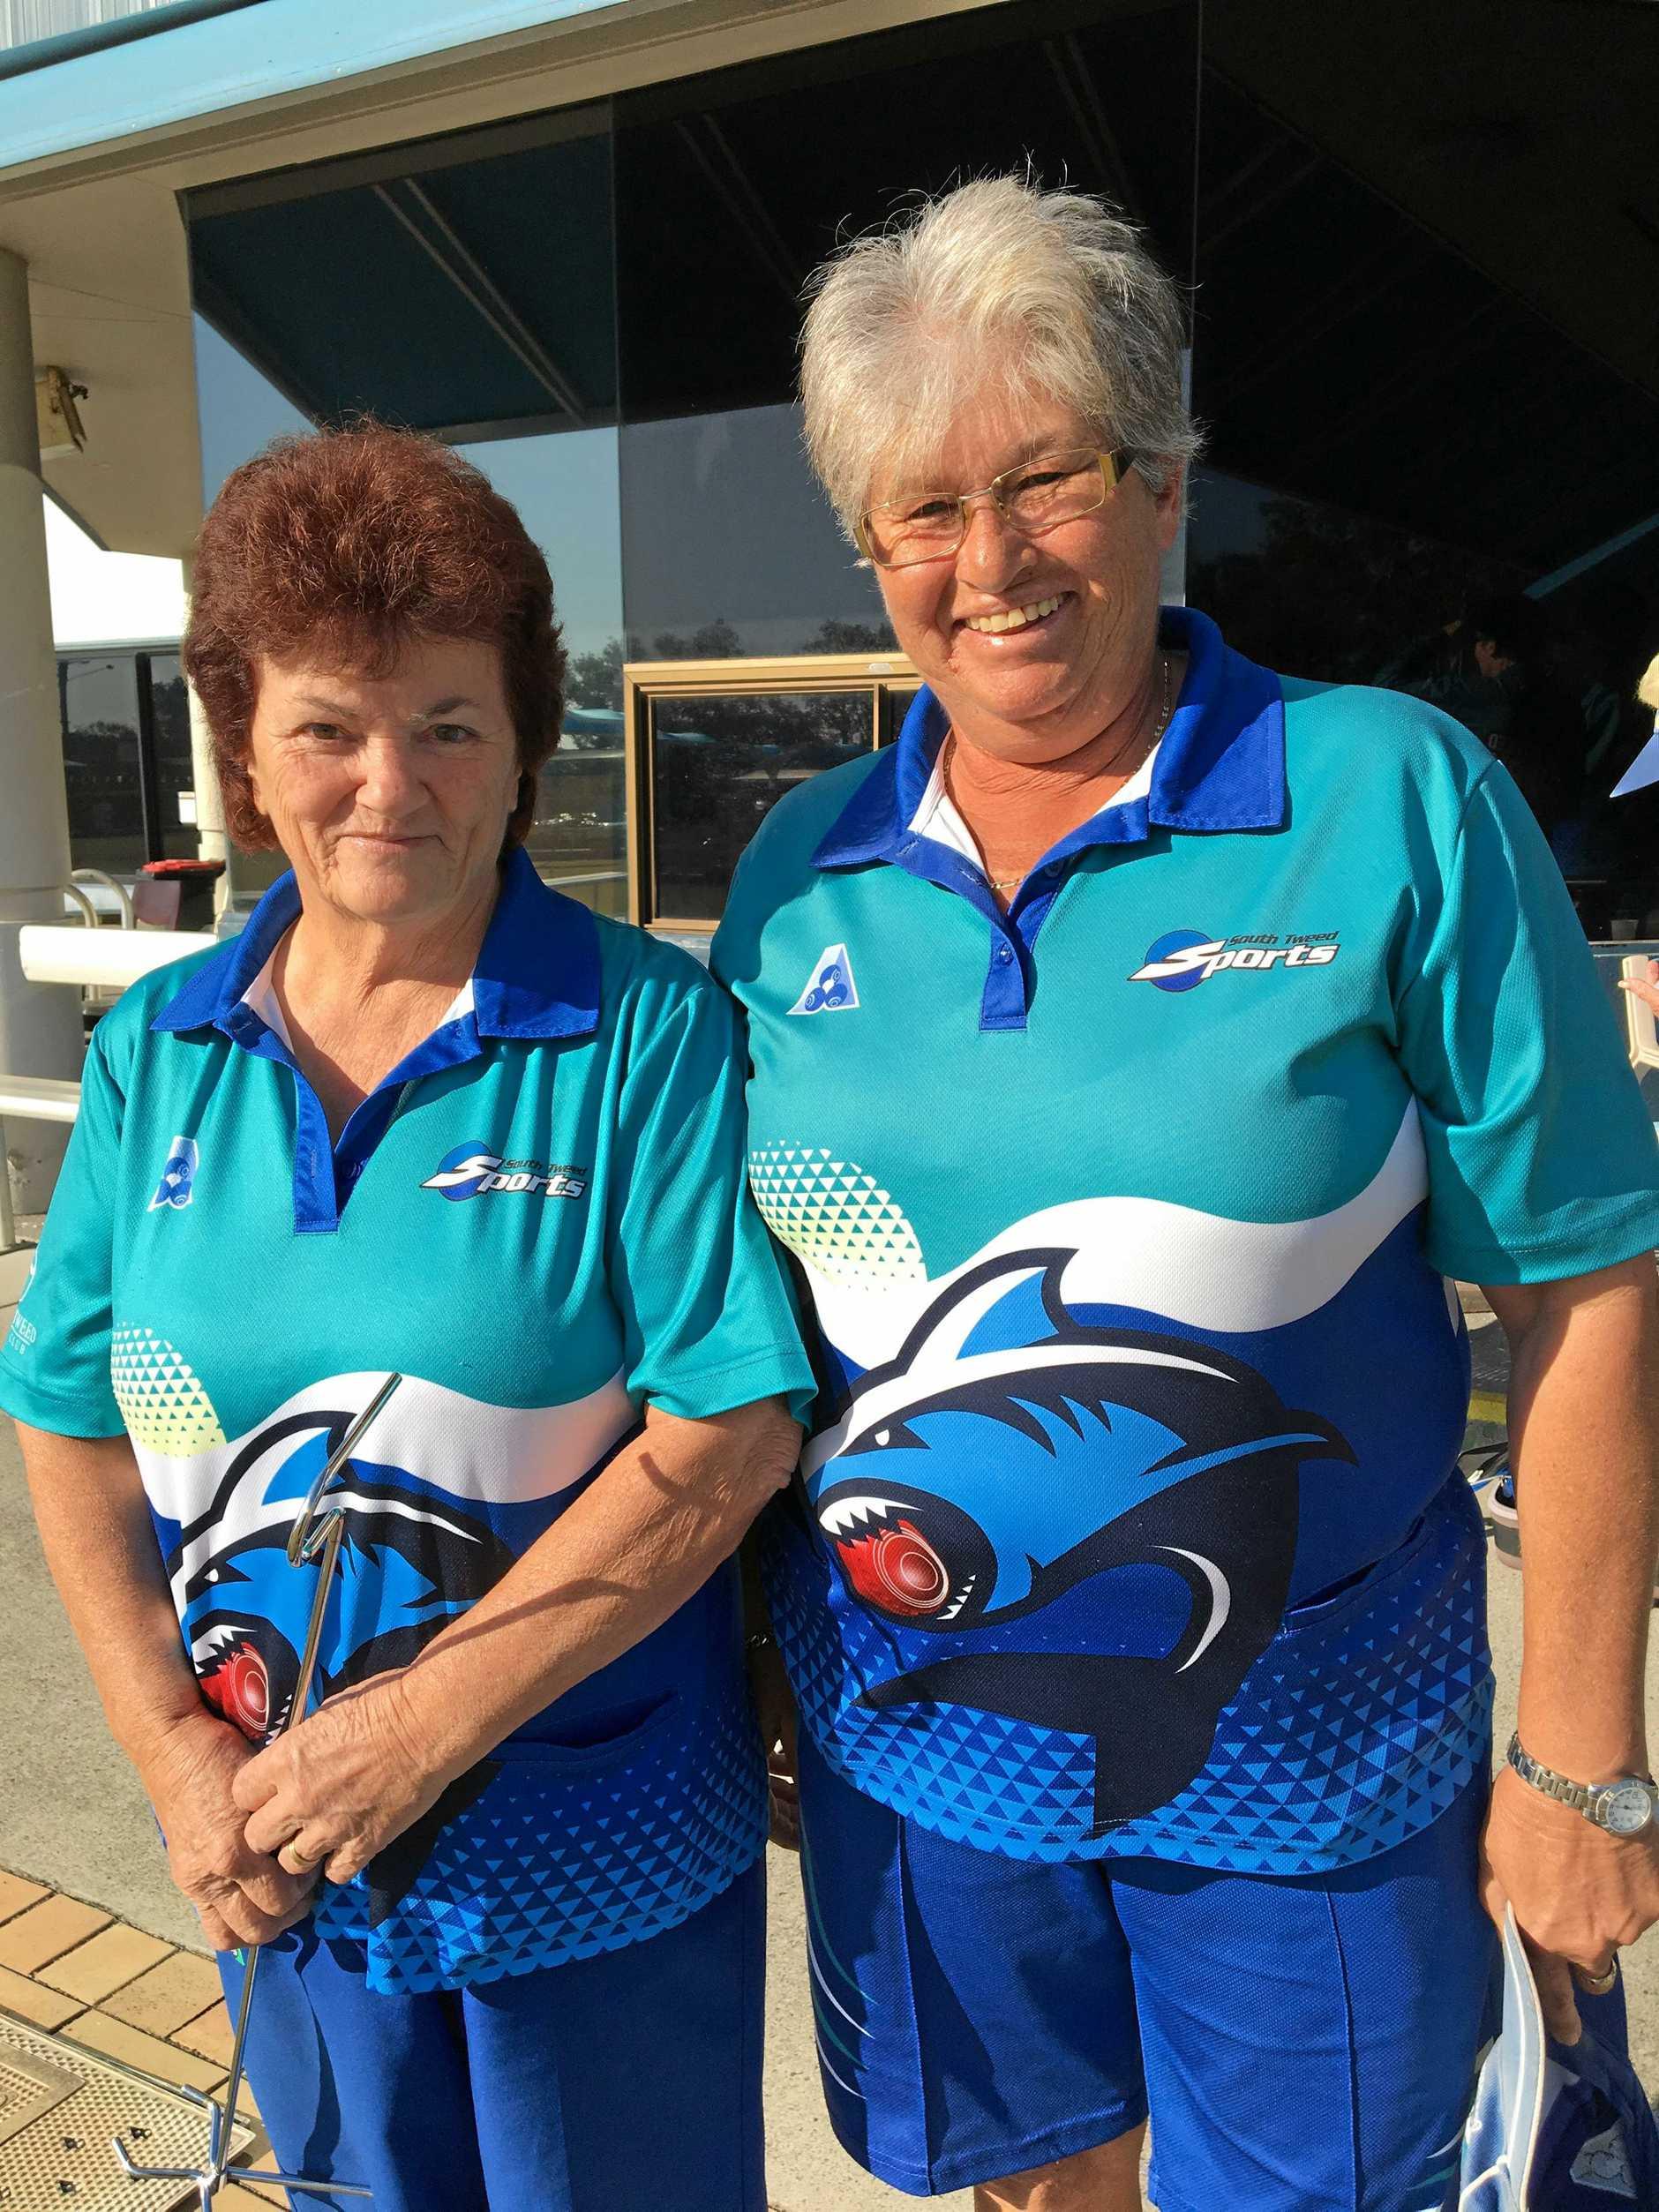 CLUB CHAMPIONS: South Tweed Bowls Club Ladies Pairs champions Sally Hickman And Cheryl Moran.